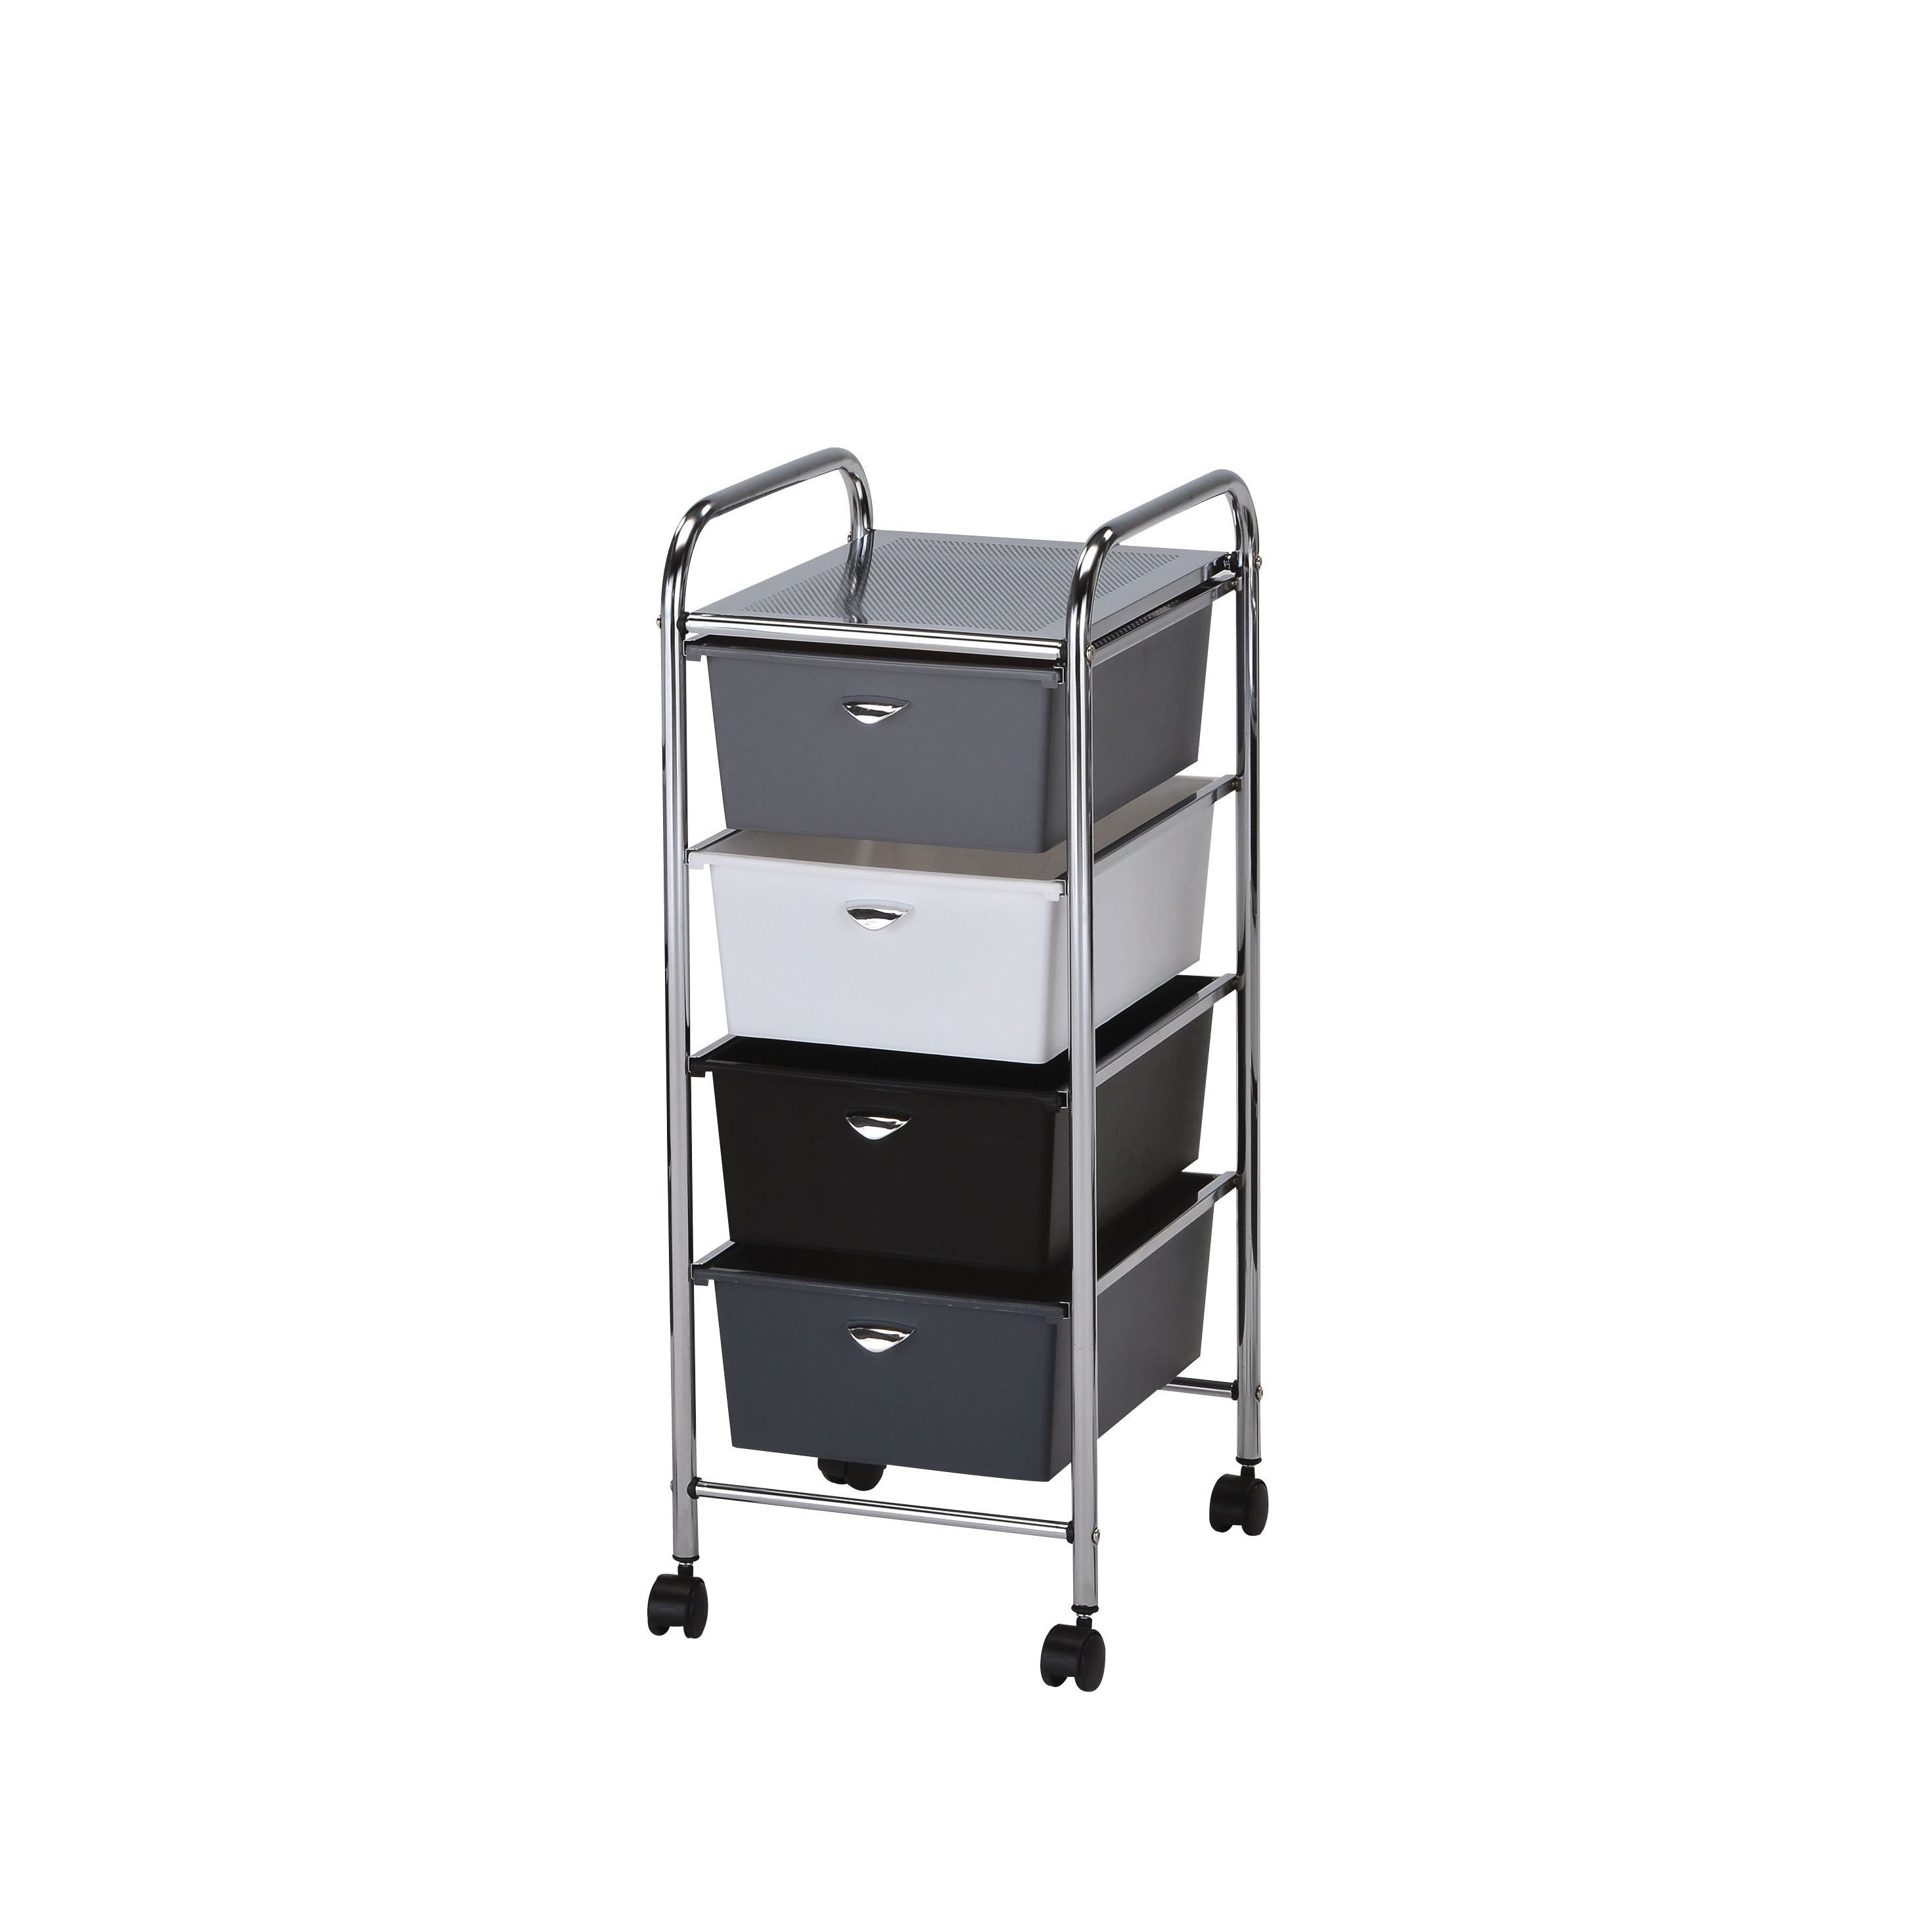 wide upc black product image drawer drawers upcitemdb spin prod for cart com storage